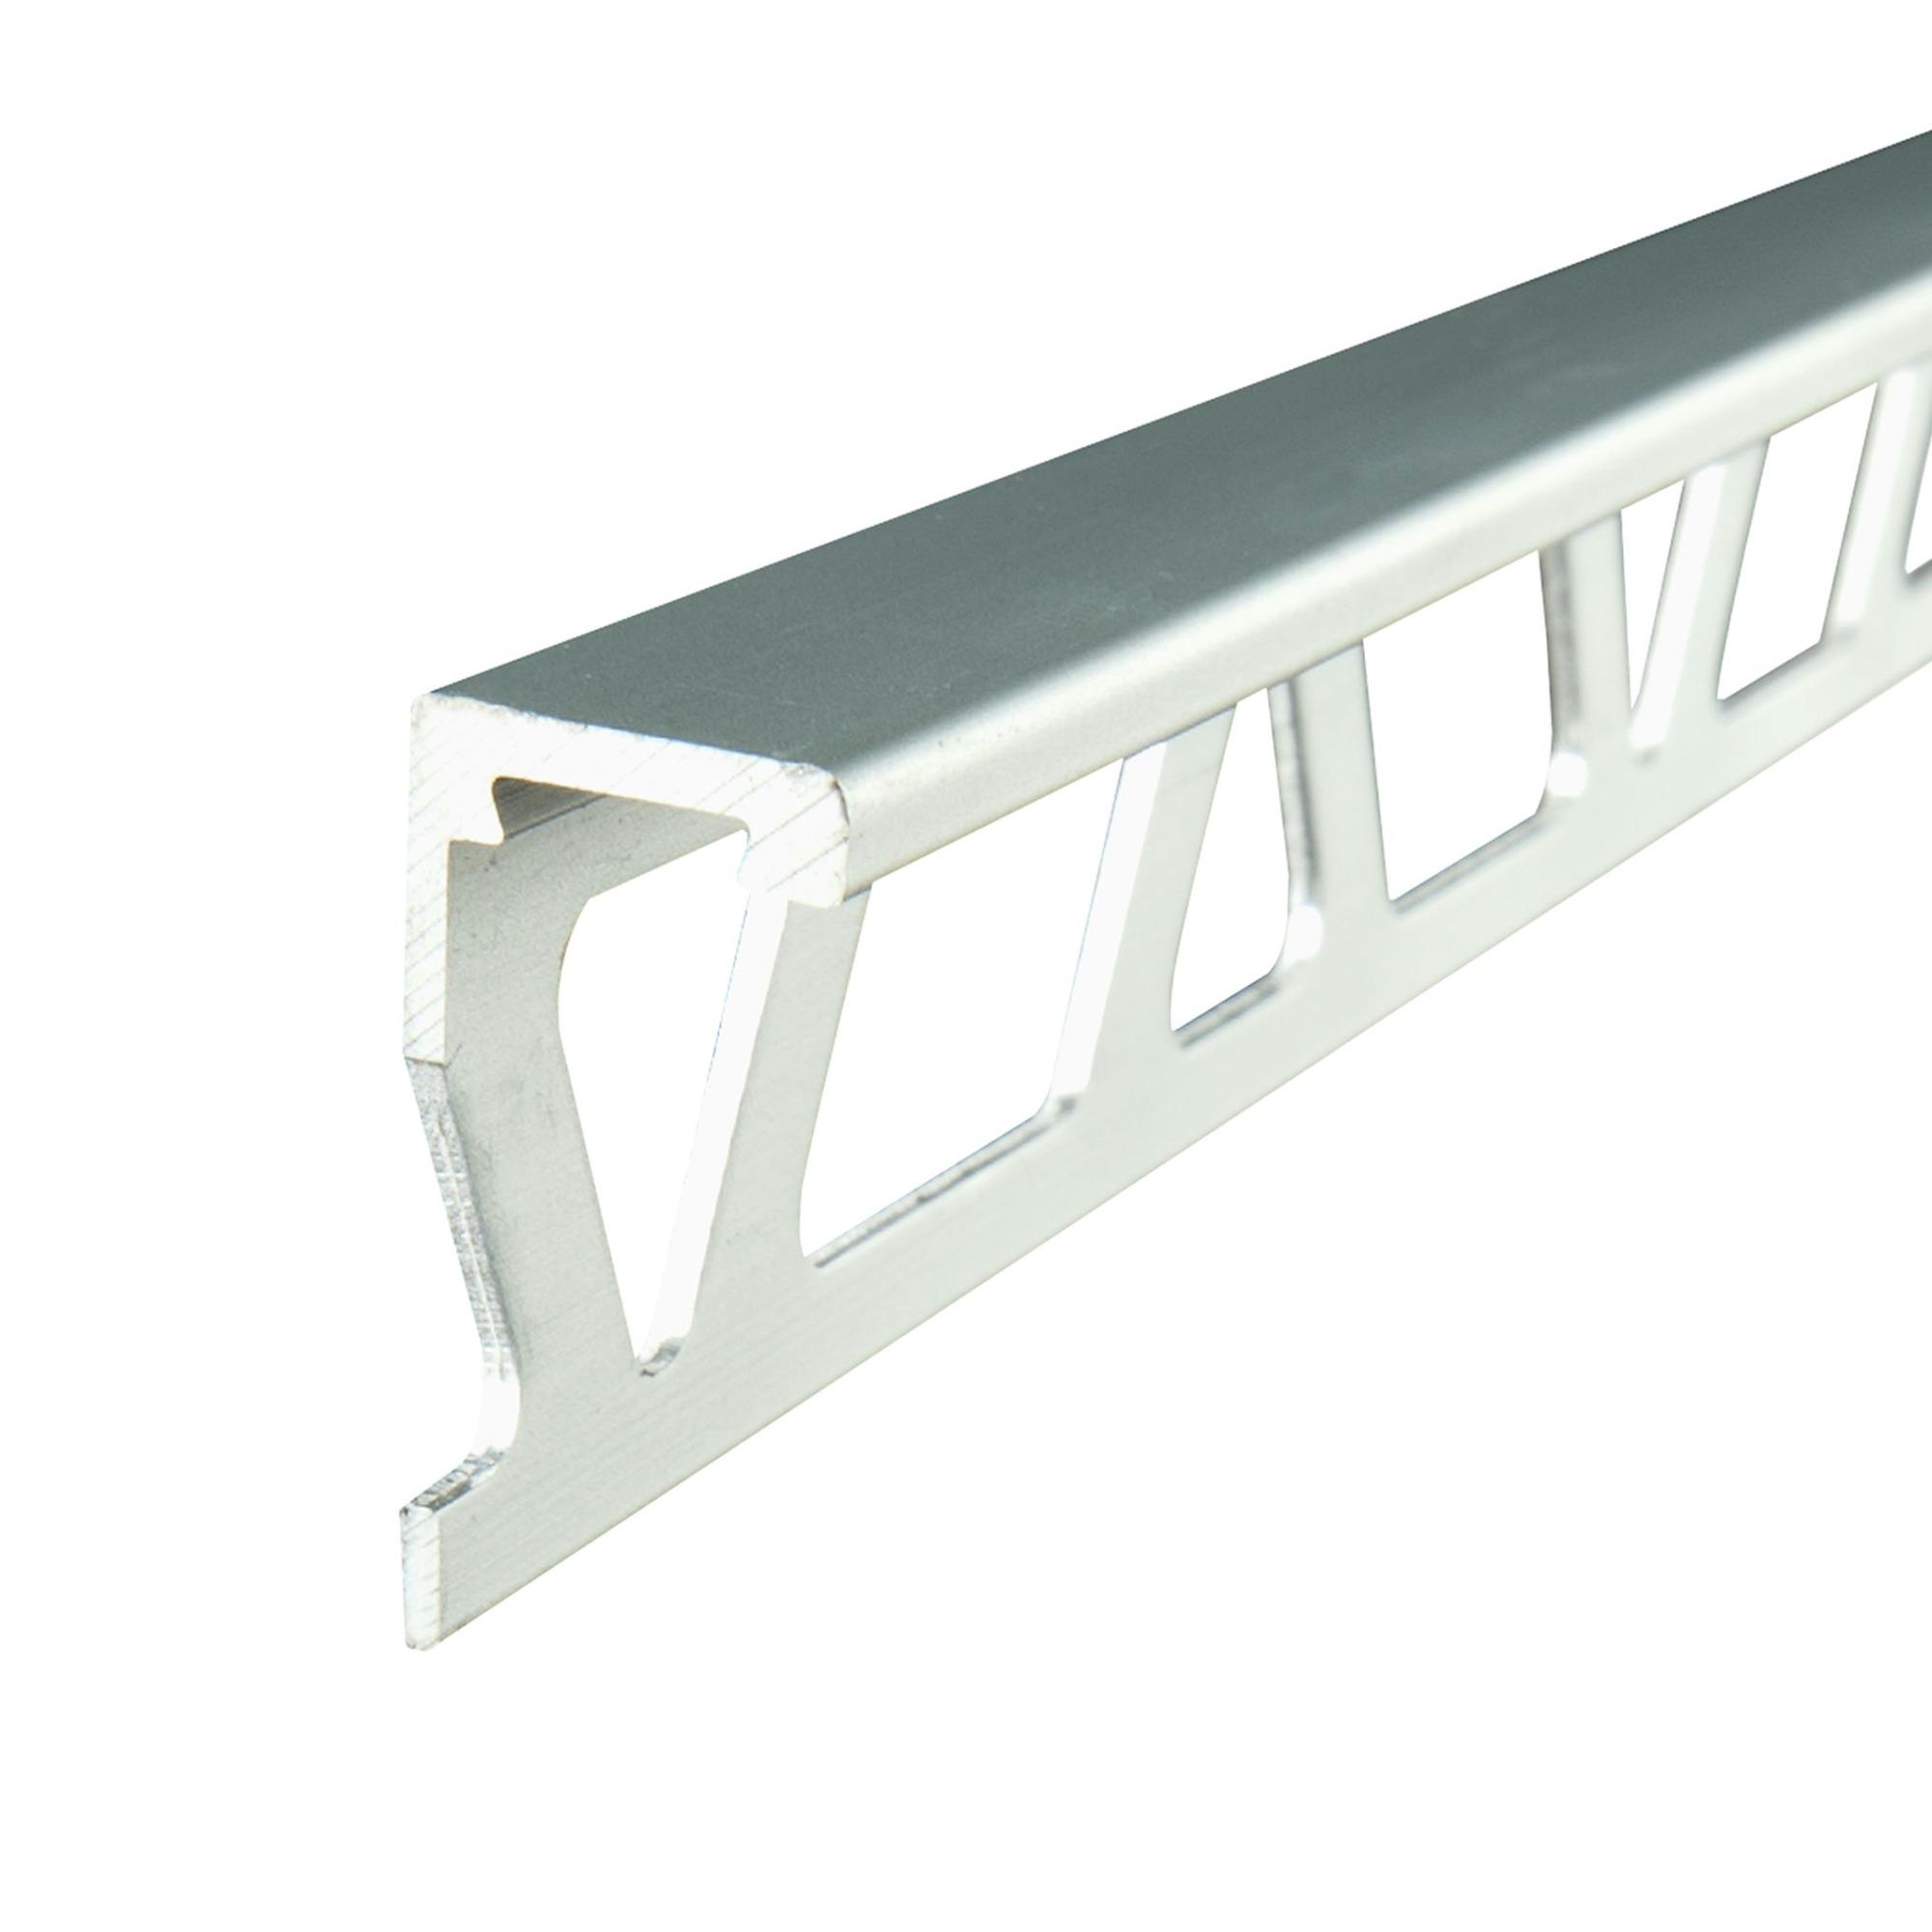 profil carrelage droit aluminium 8mm argent mat 270cm. Black Bedroom Furniture Sets. Home Design Ideas